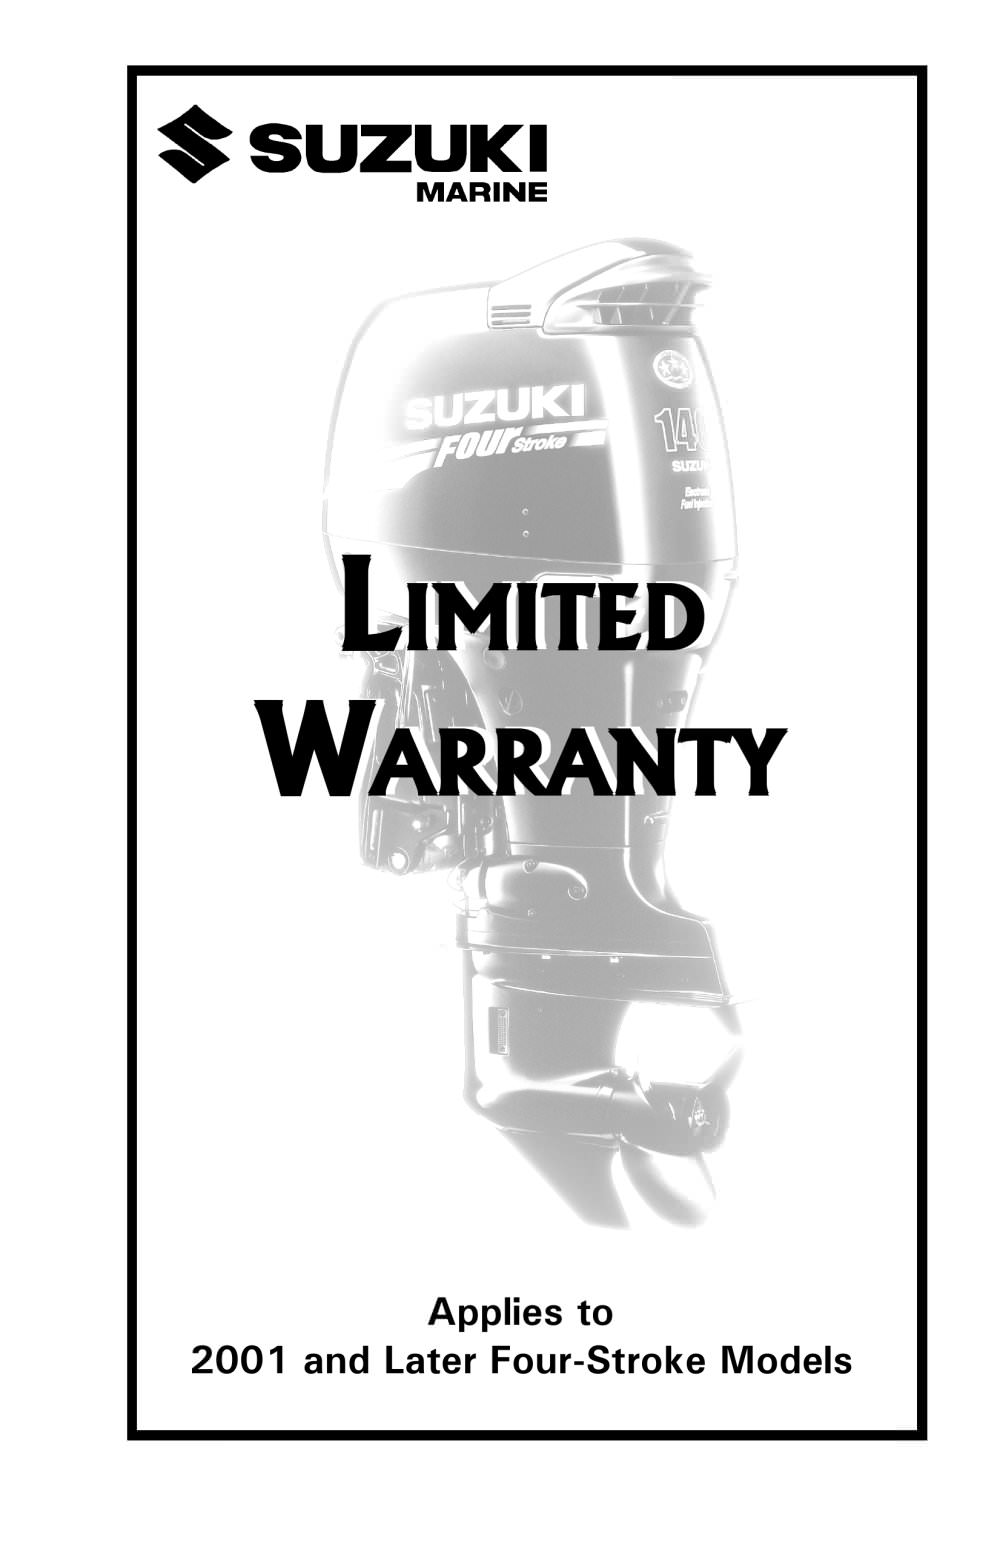 suzuki limited warranty booklet suzuki marine pdf catalogues rh pdf nauticexpo com Suzuki Cars Suzuki Marine Dealer Sign